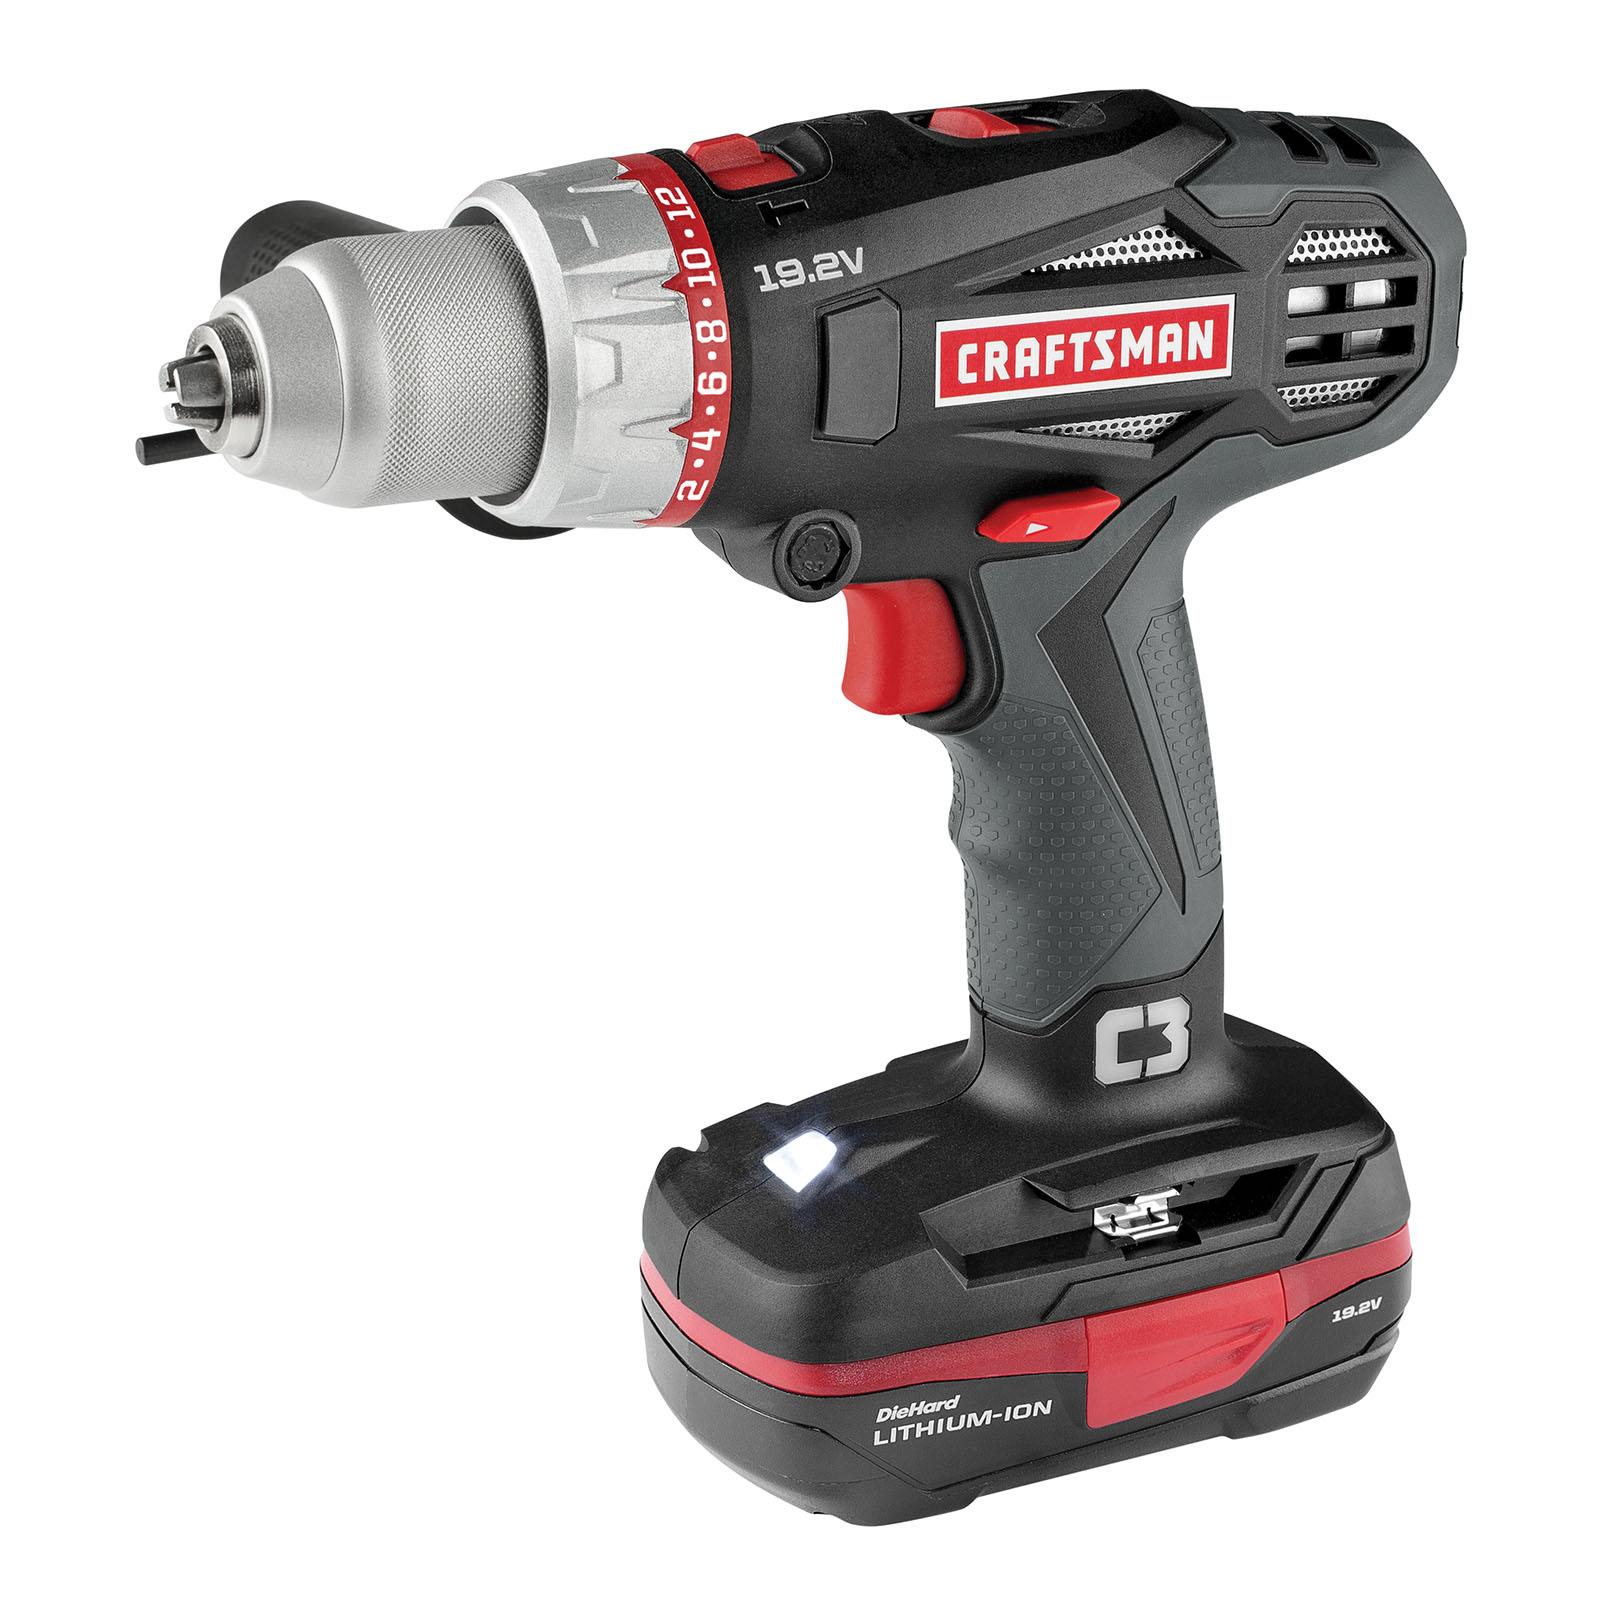 Craftsman C3 19.2-volt 2-speed Hammer Drill Kit